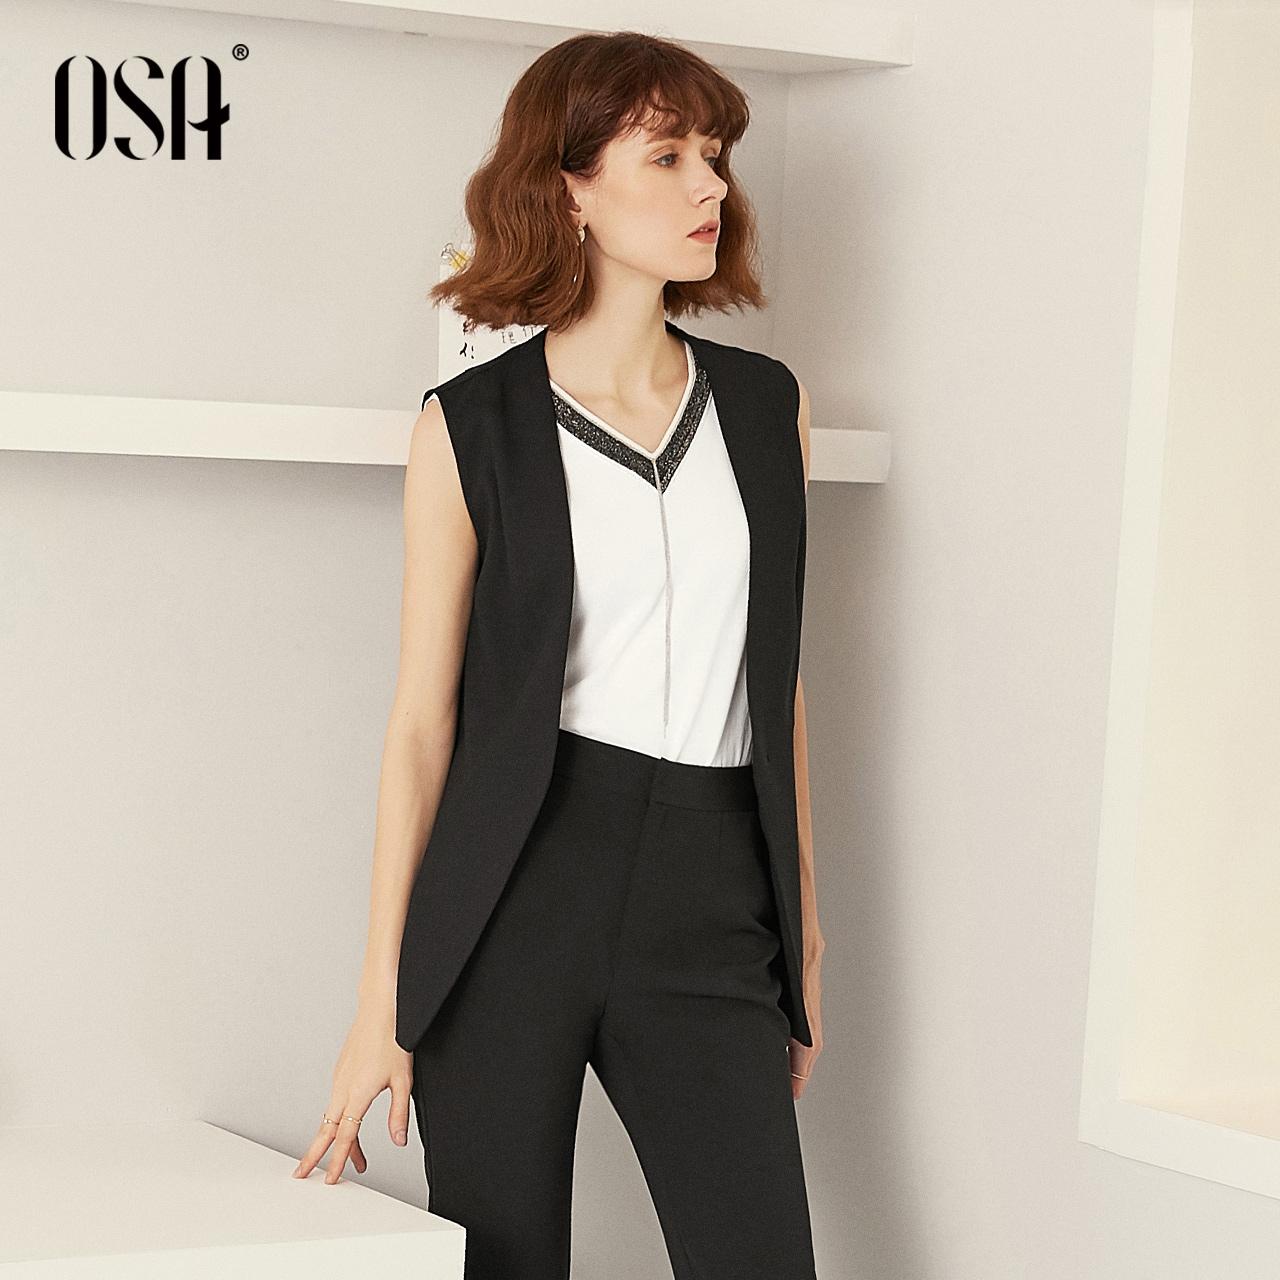 OSA欧莎马甲夏天外穿女2019外搭开衫西装坎肩马夹薄款开叉外套潮